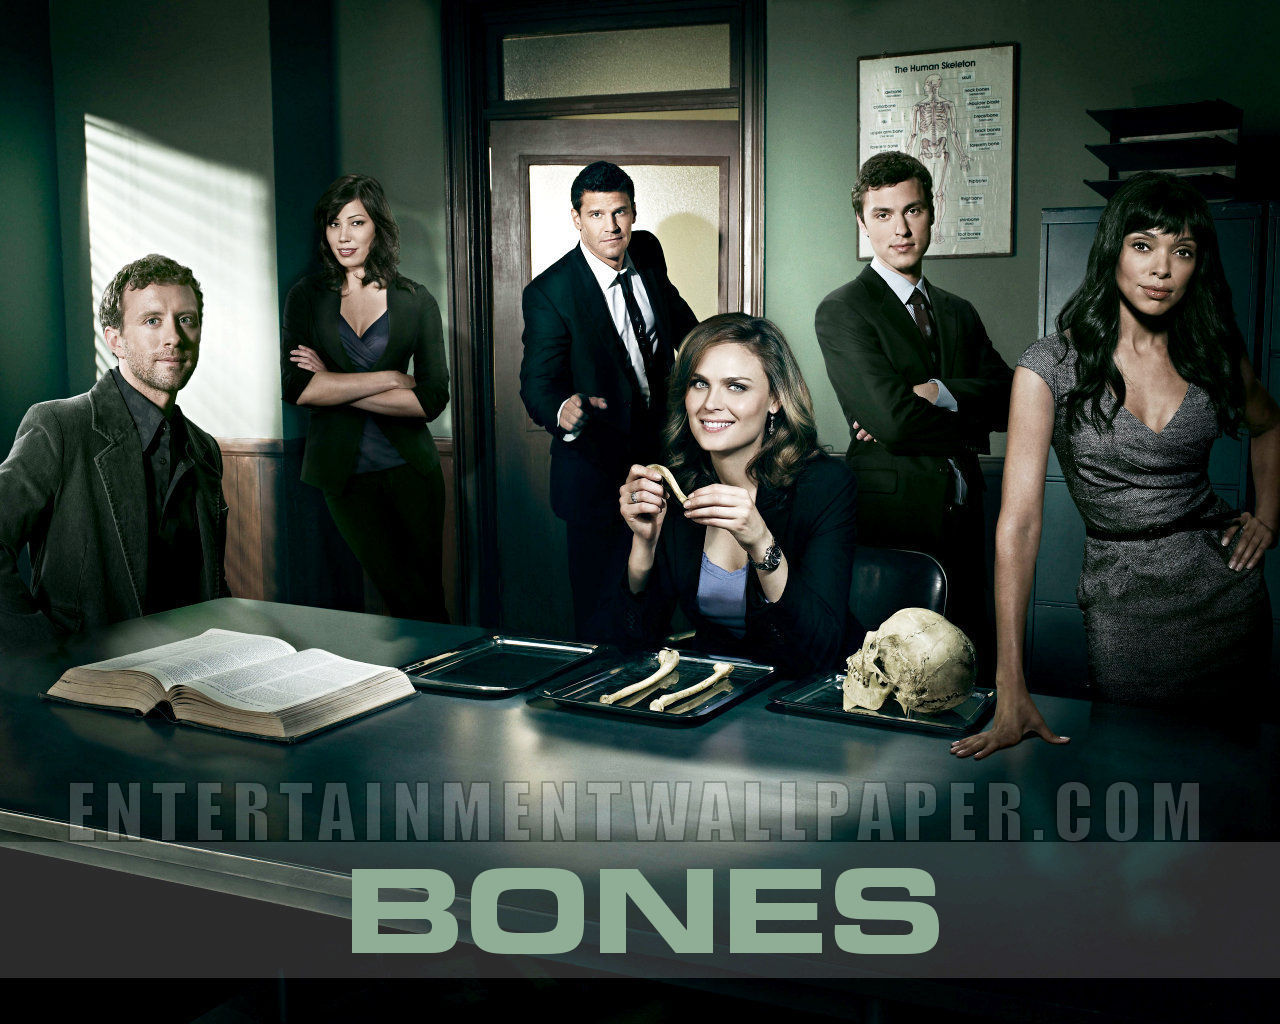 bones wallpaper